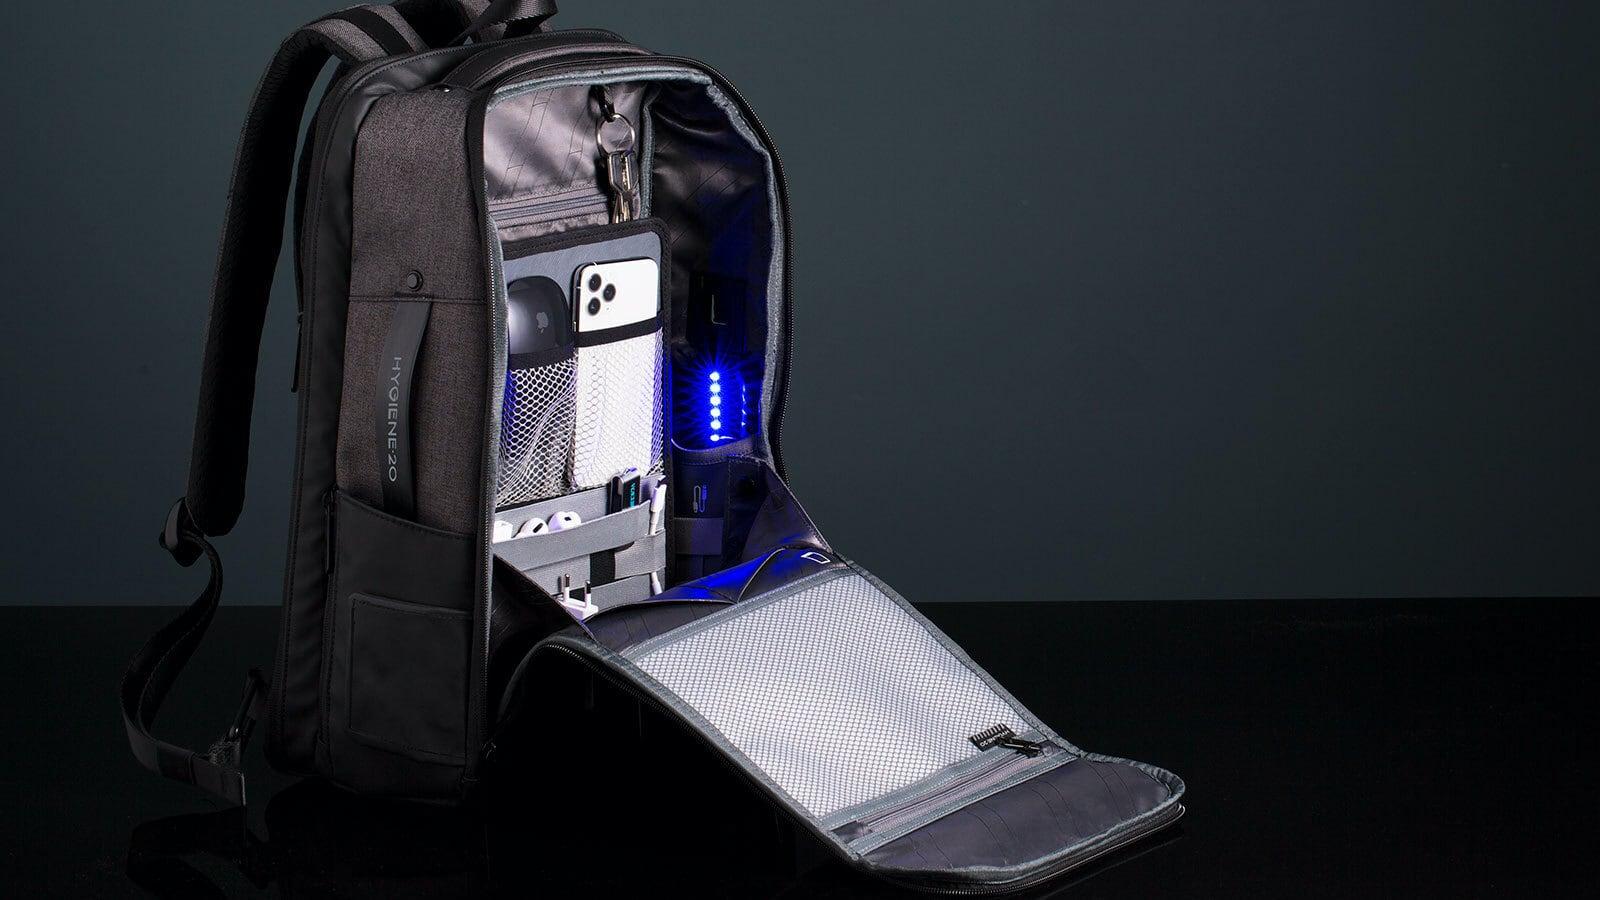 Hygiene20 Smart Sanitizing Backpack has a UV-C light, electronic sanitizer dispenser, and more